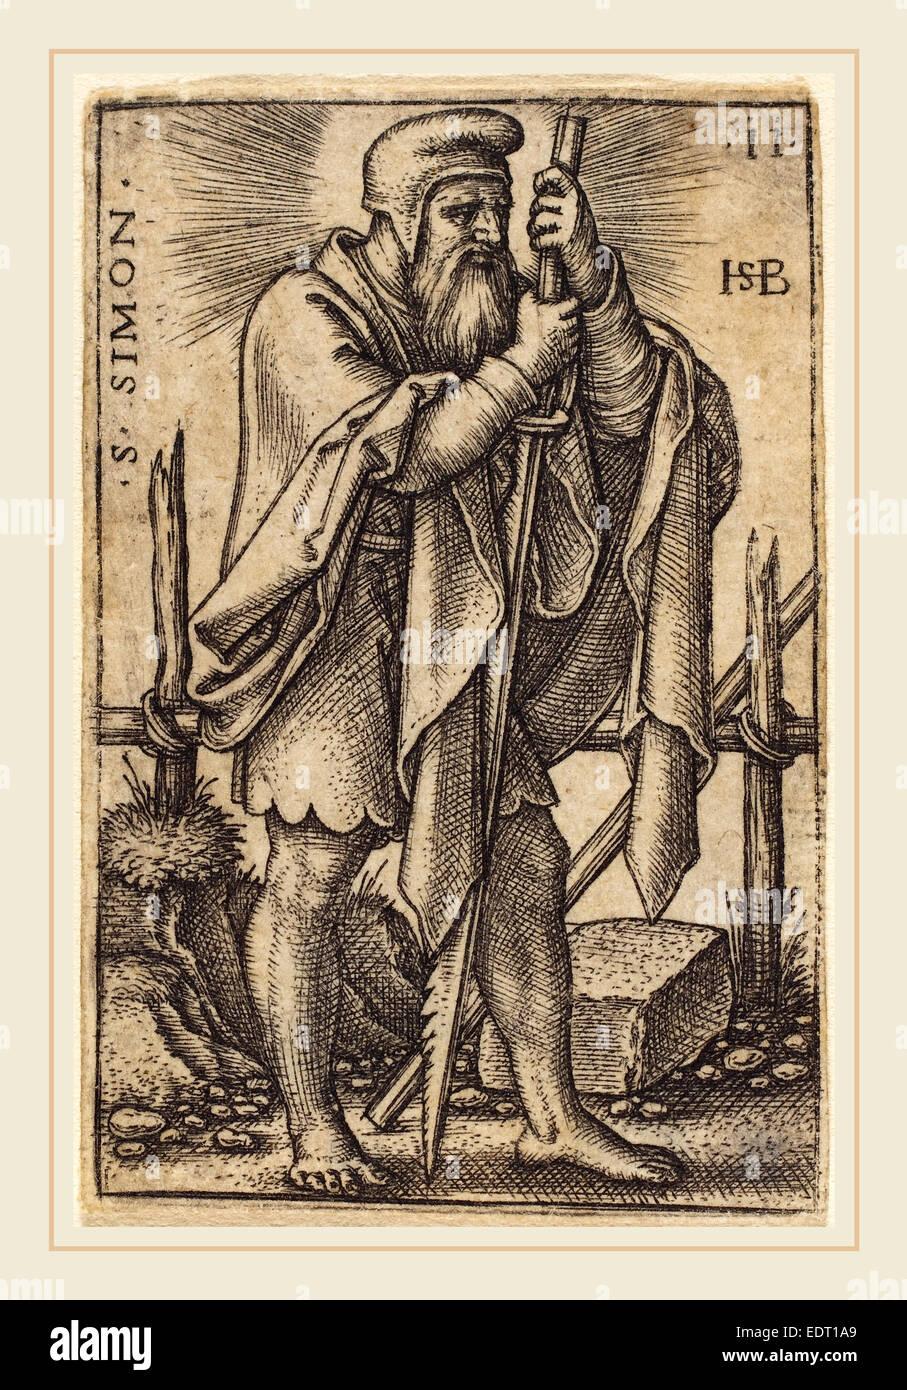 Sebald Beham (German, 1500-1550), Simon, engraving - Stock Image